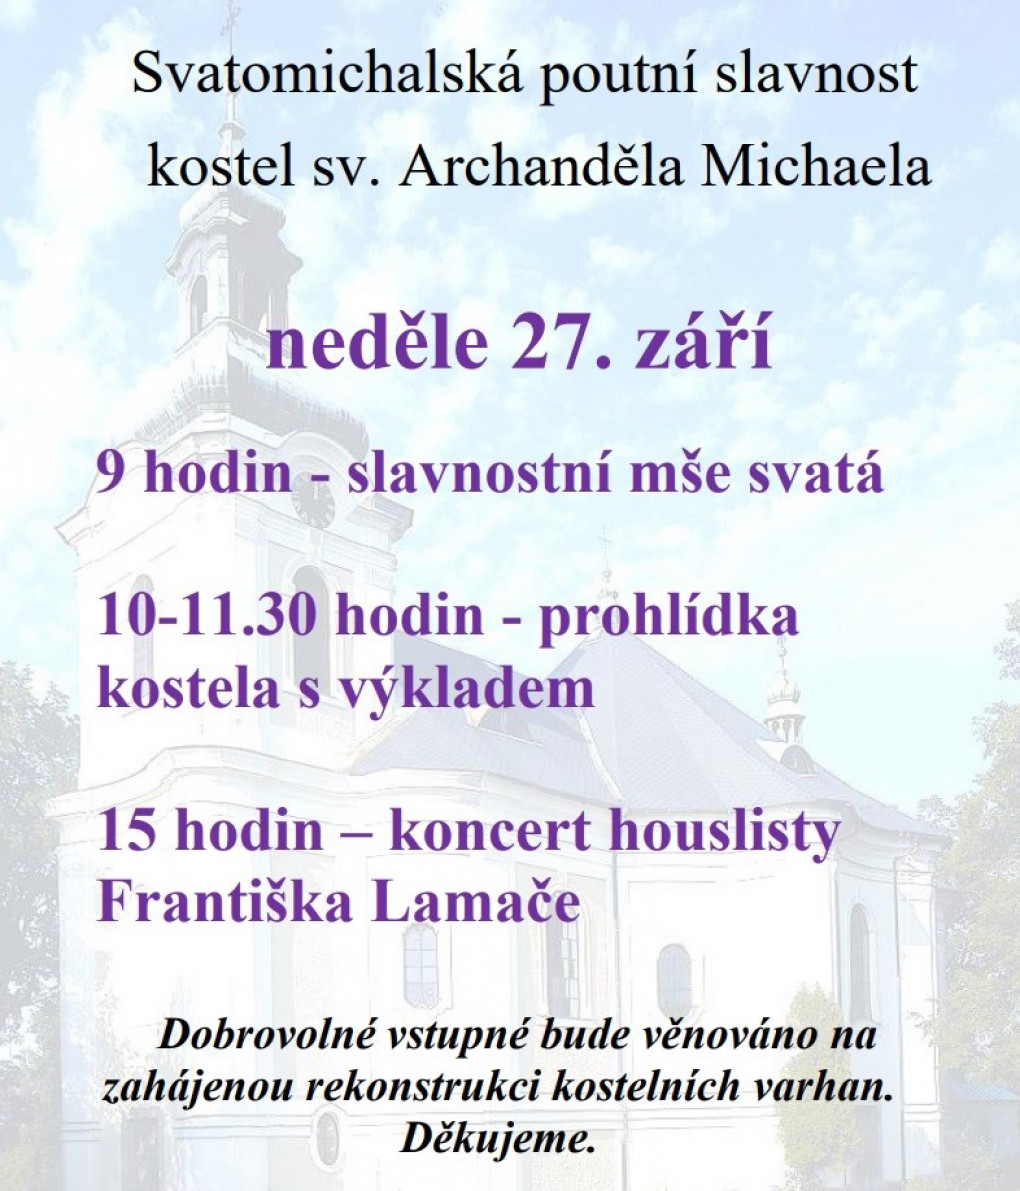 svatomichalska_poutni_slavnost.jpg